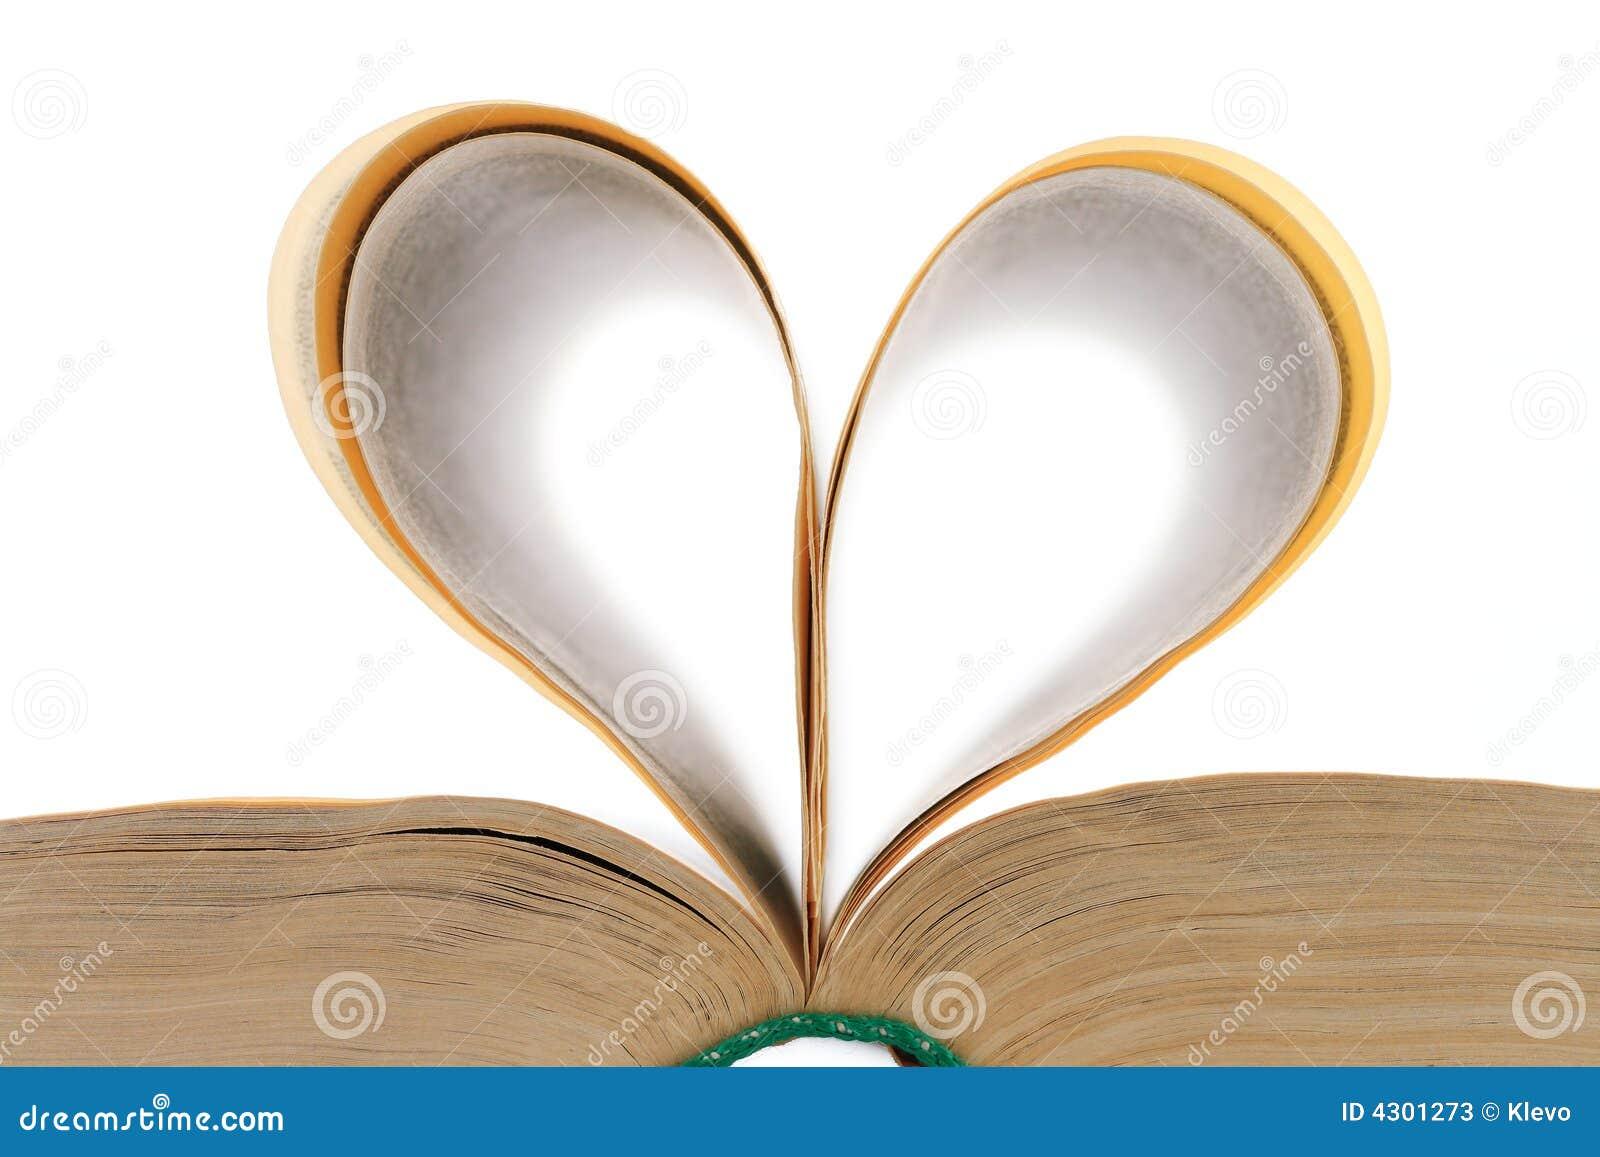 Heart shaped book leaves